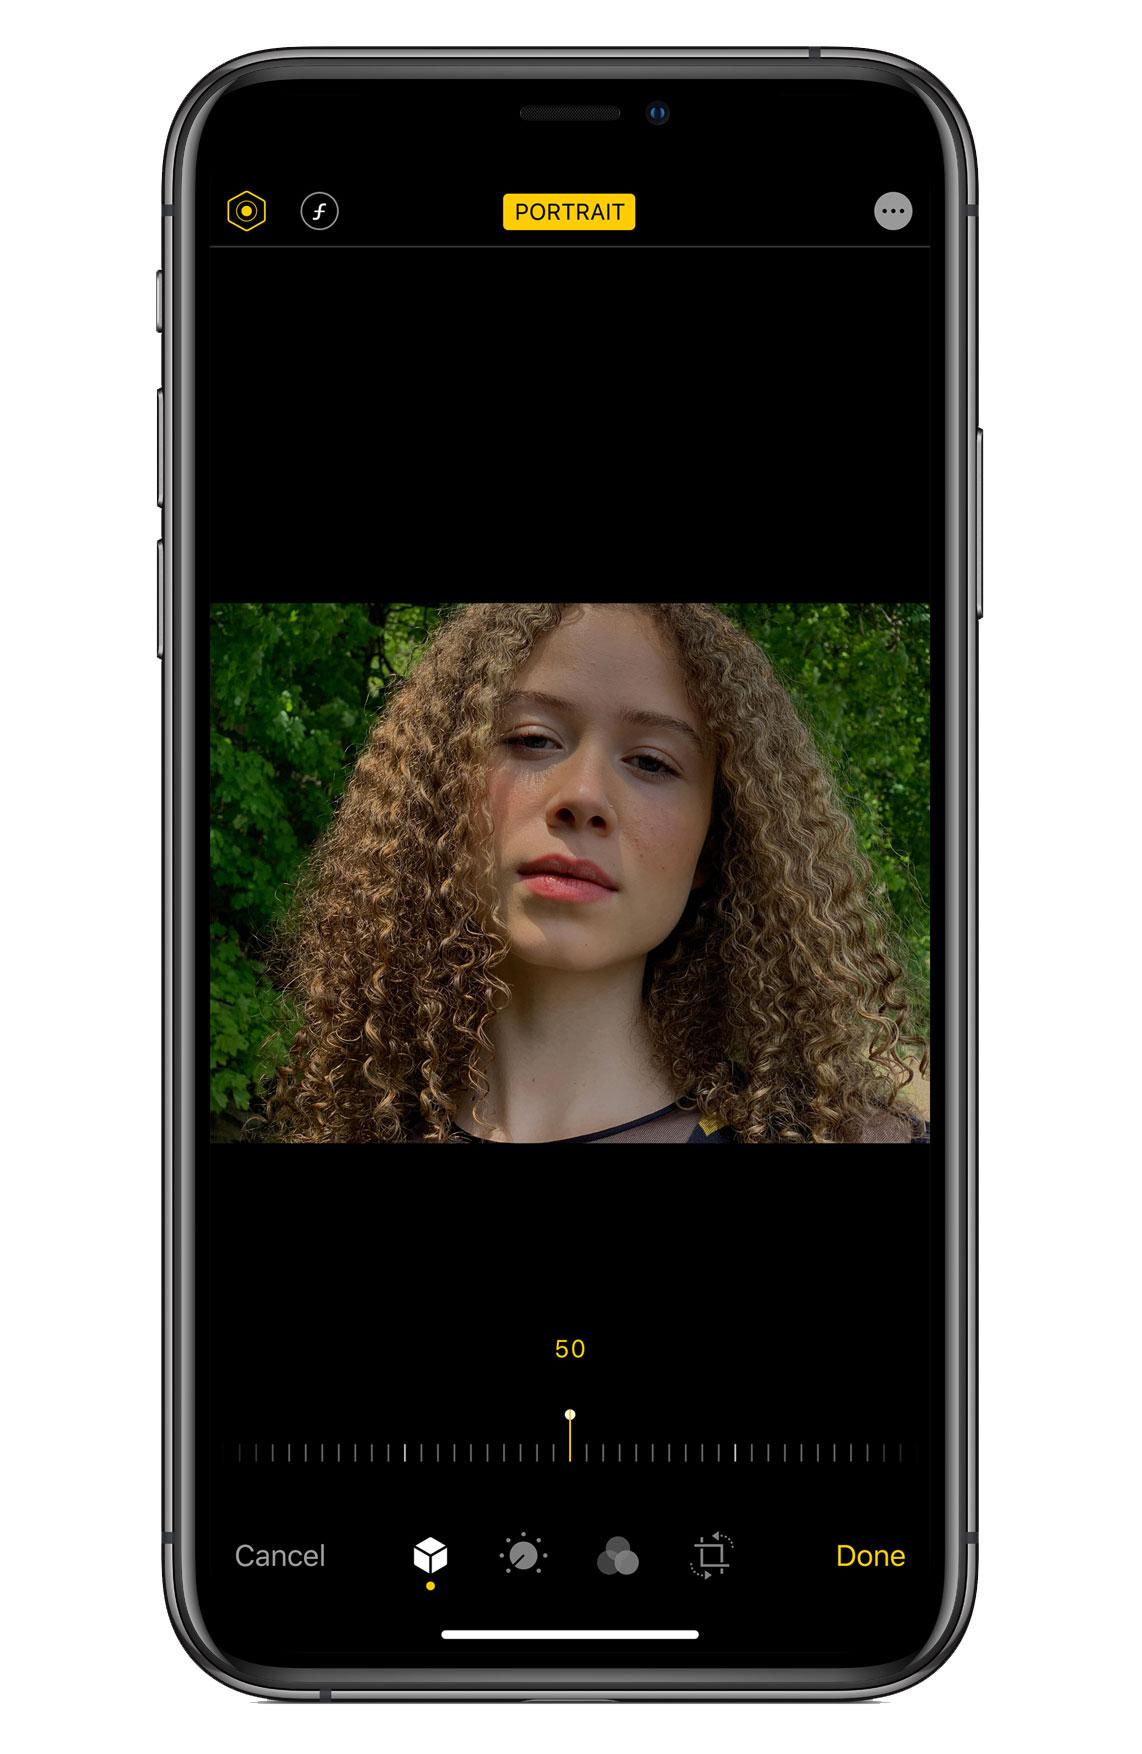 https://www.macfreak.nl/modules/news/images/zArt.iOS13Photos-iPhone-2.jpg